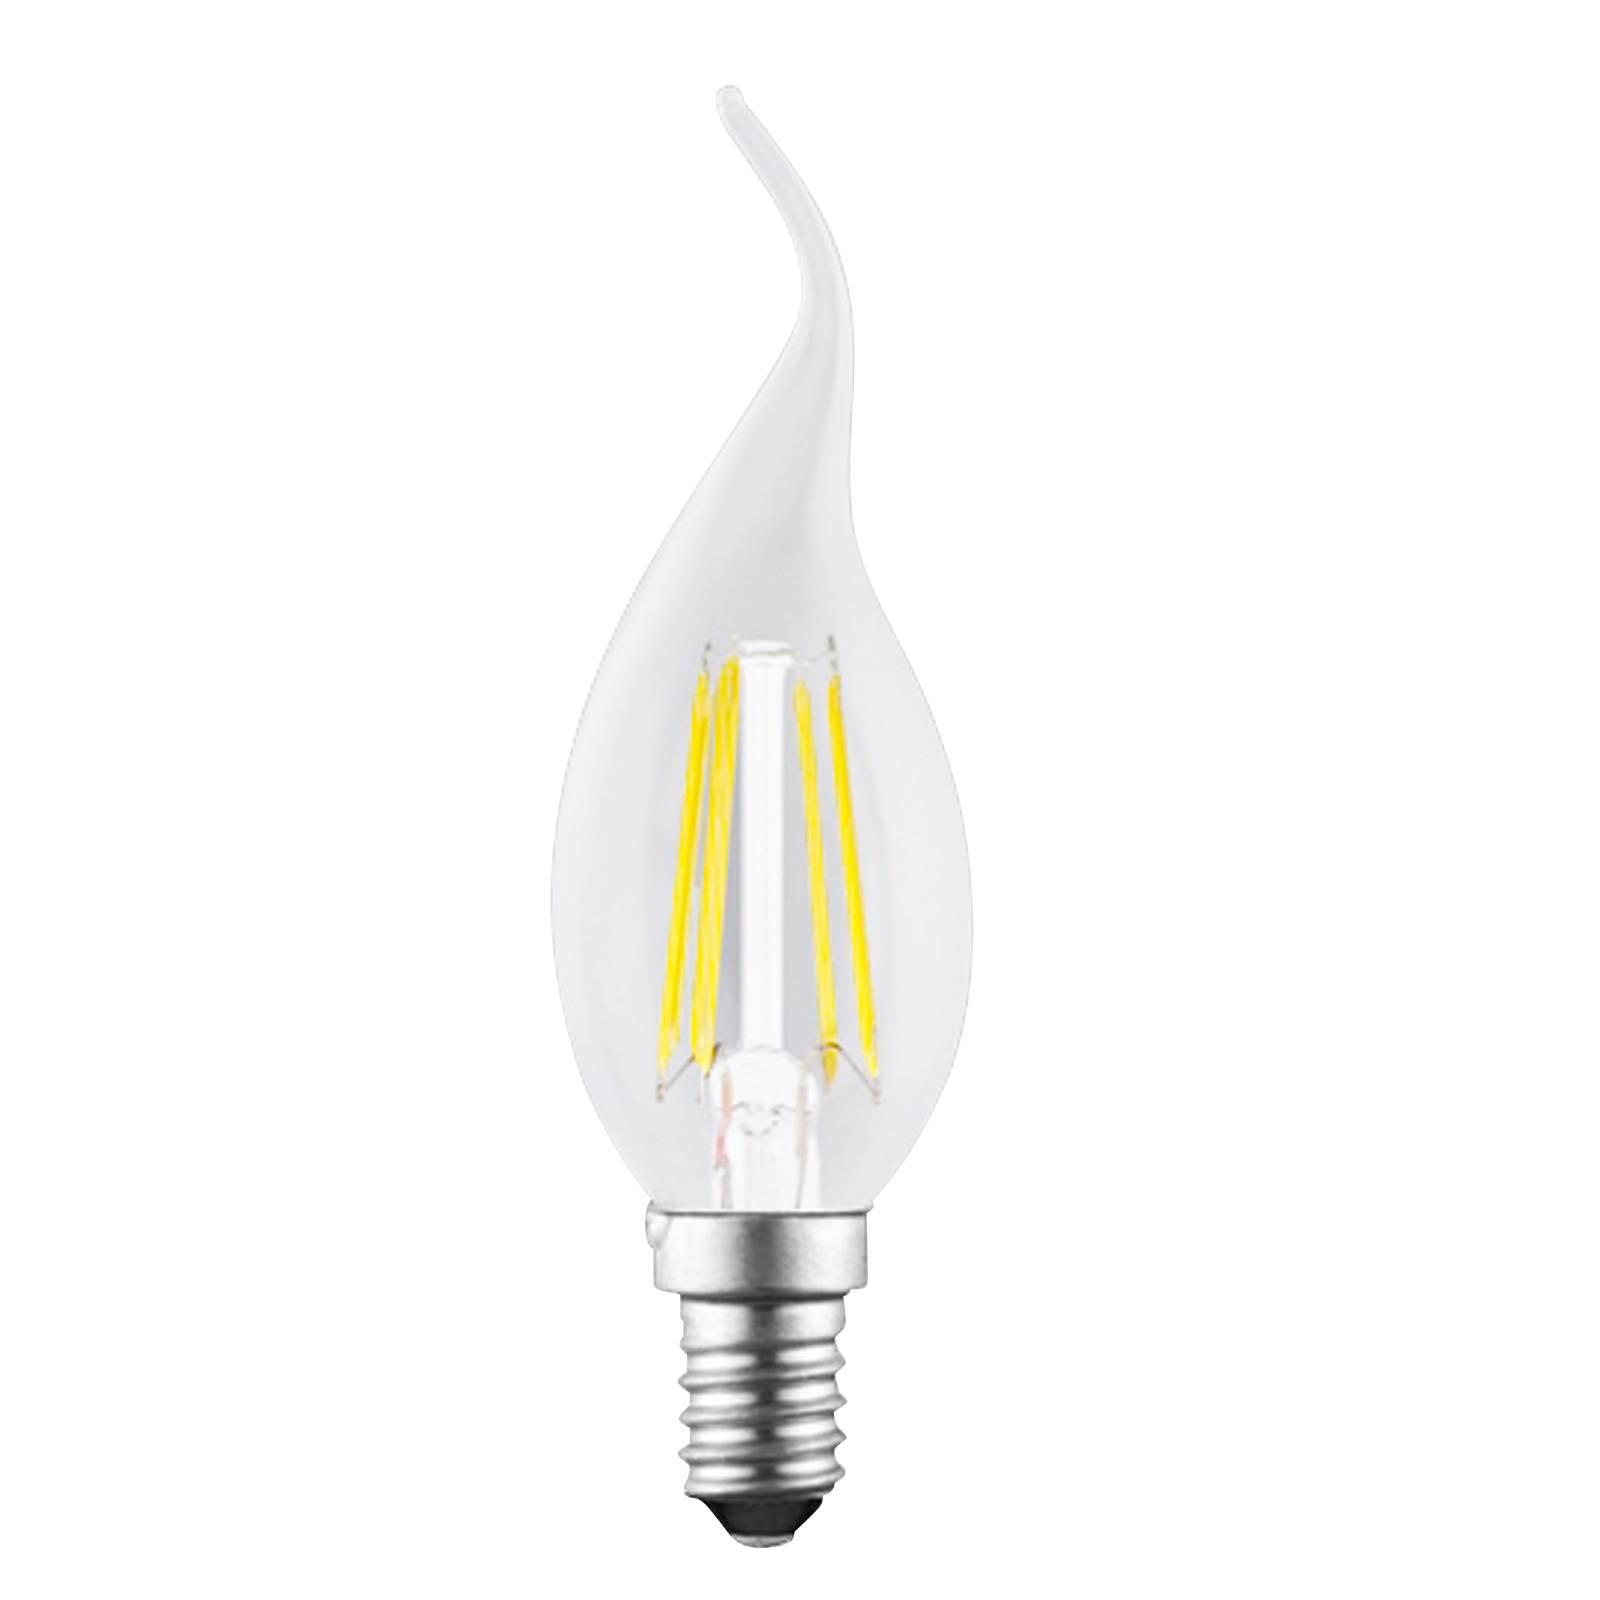 LED-kynttilälamppu E14 4W Filament kirkas 827